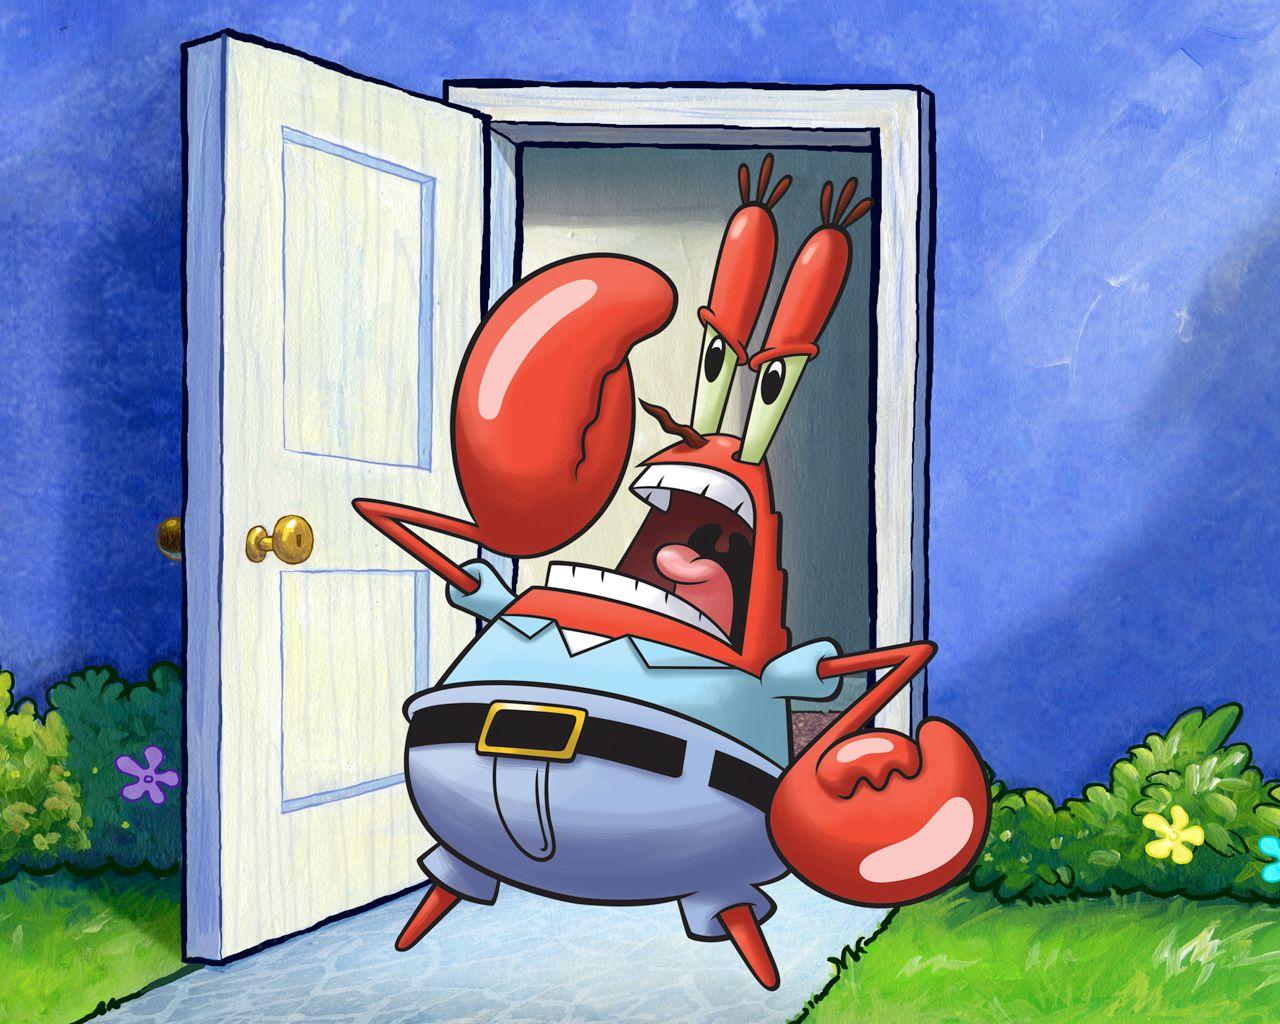 mr krabs yelling wallpaper 73173